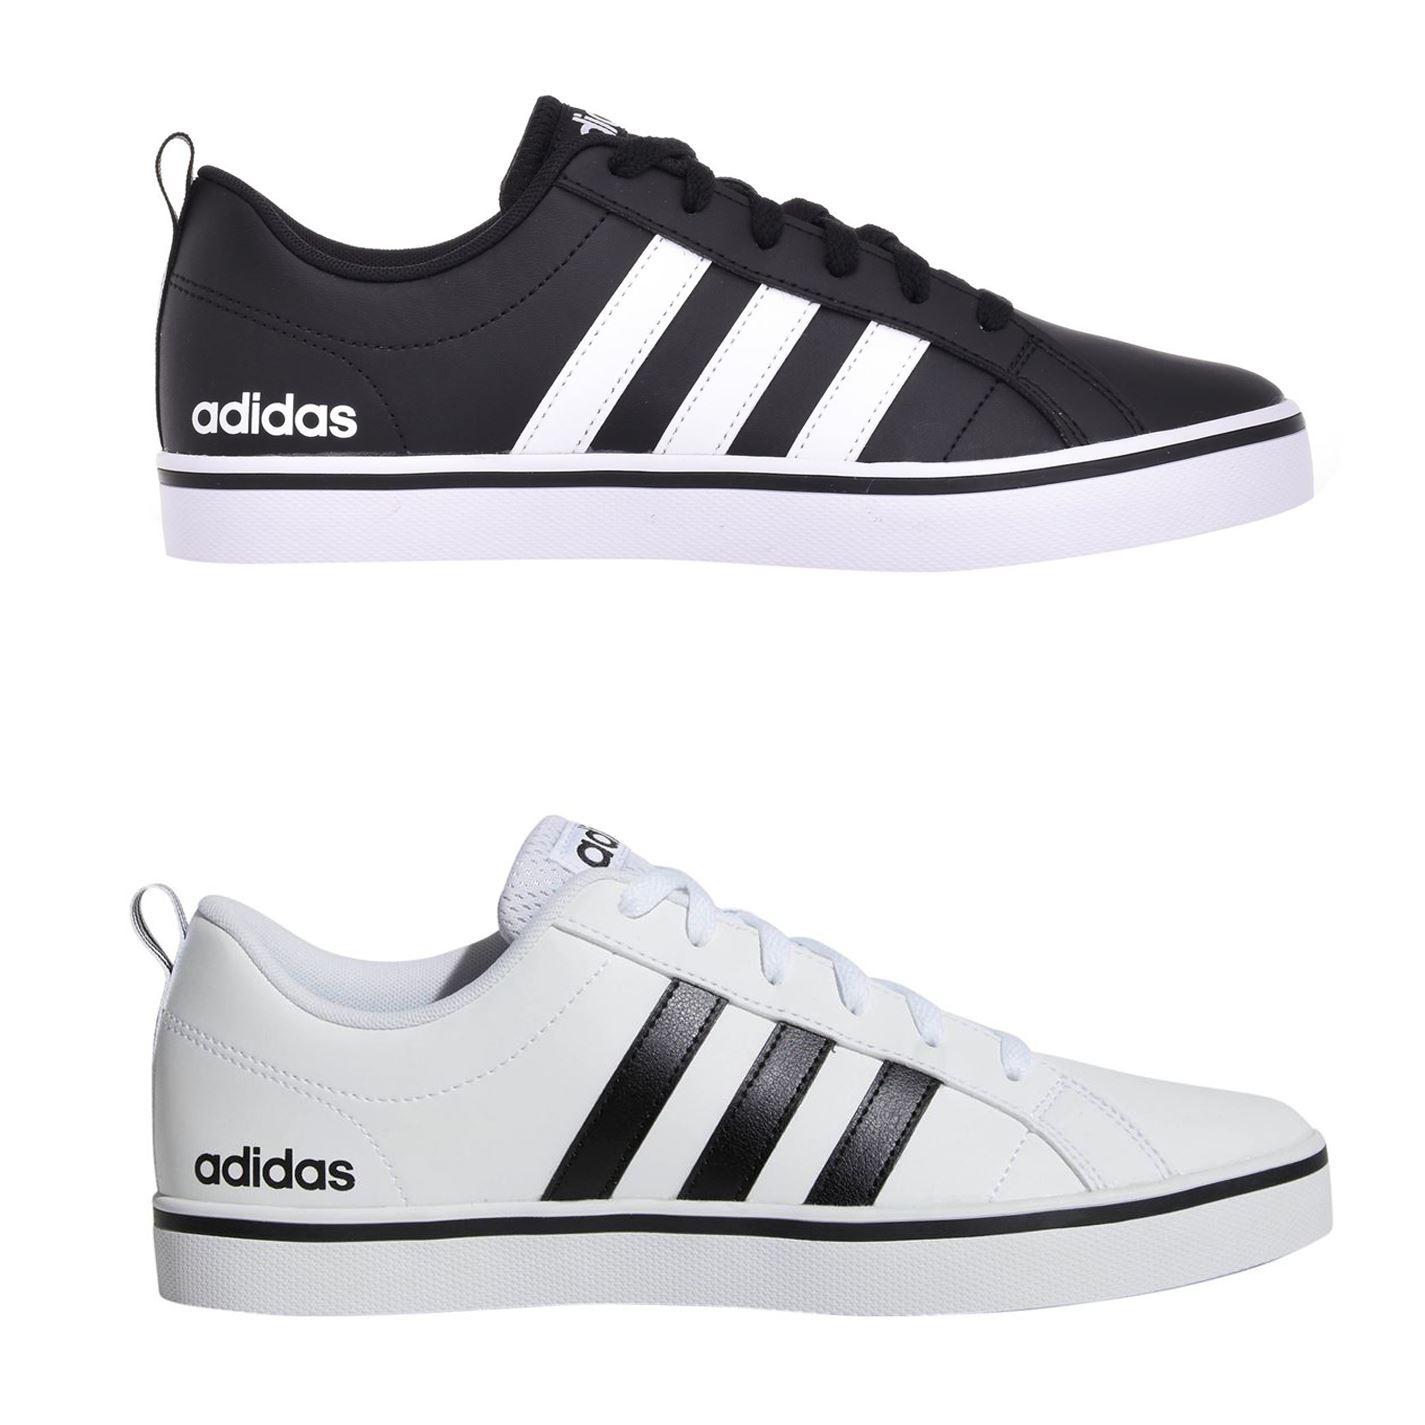 adidas VS Pace Sneakers for Men, Size 44 23 EU, Black